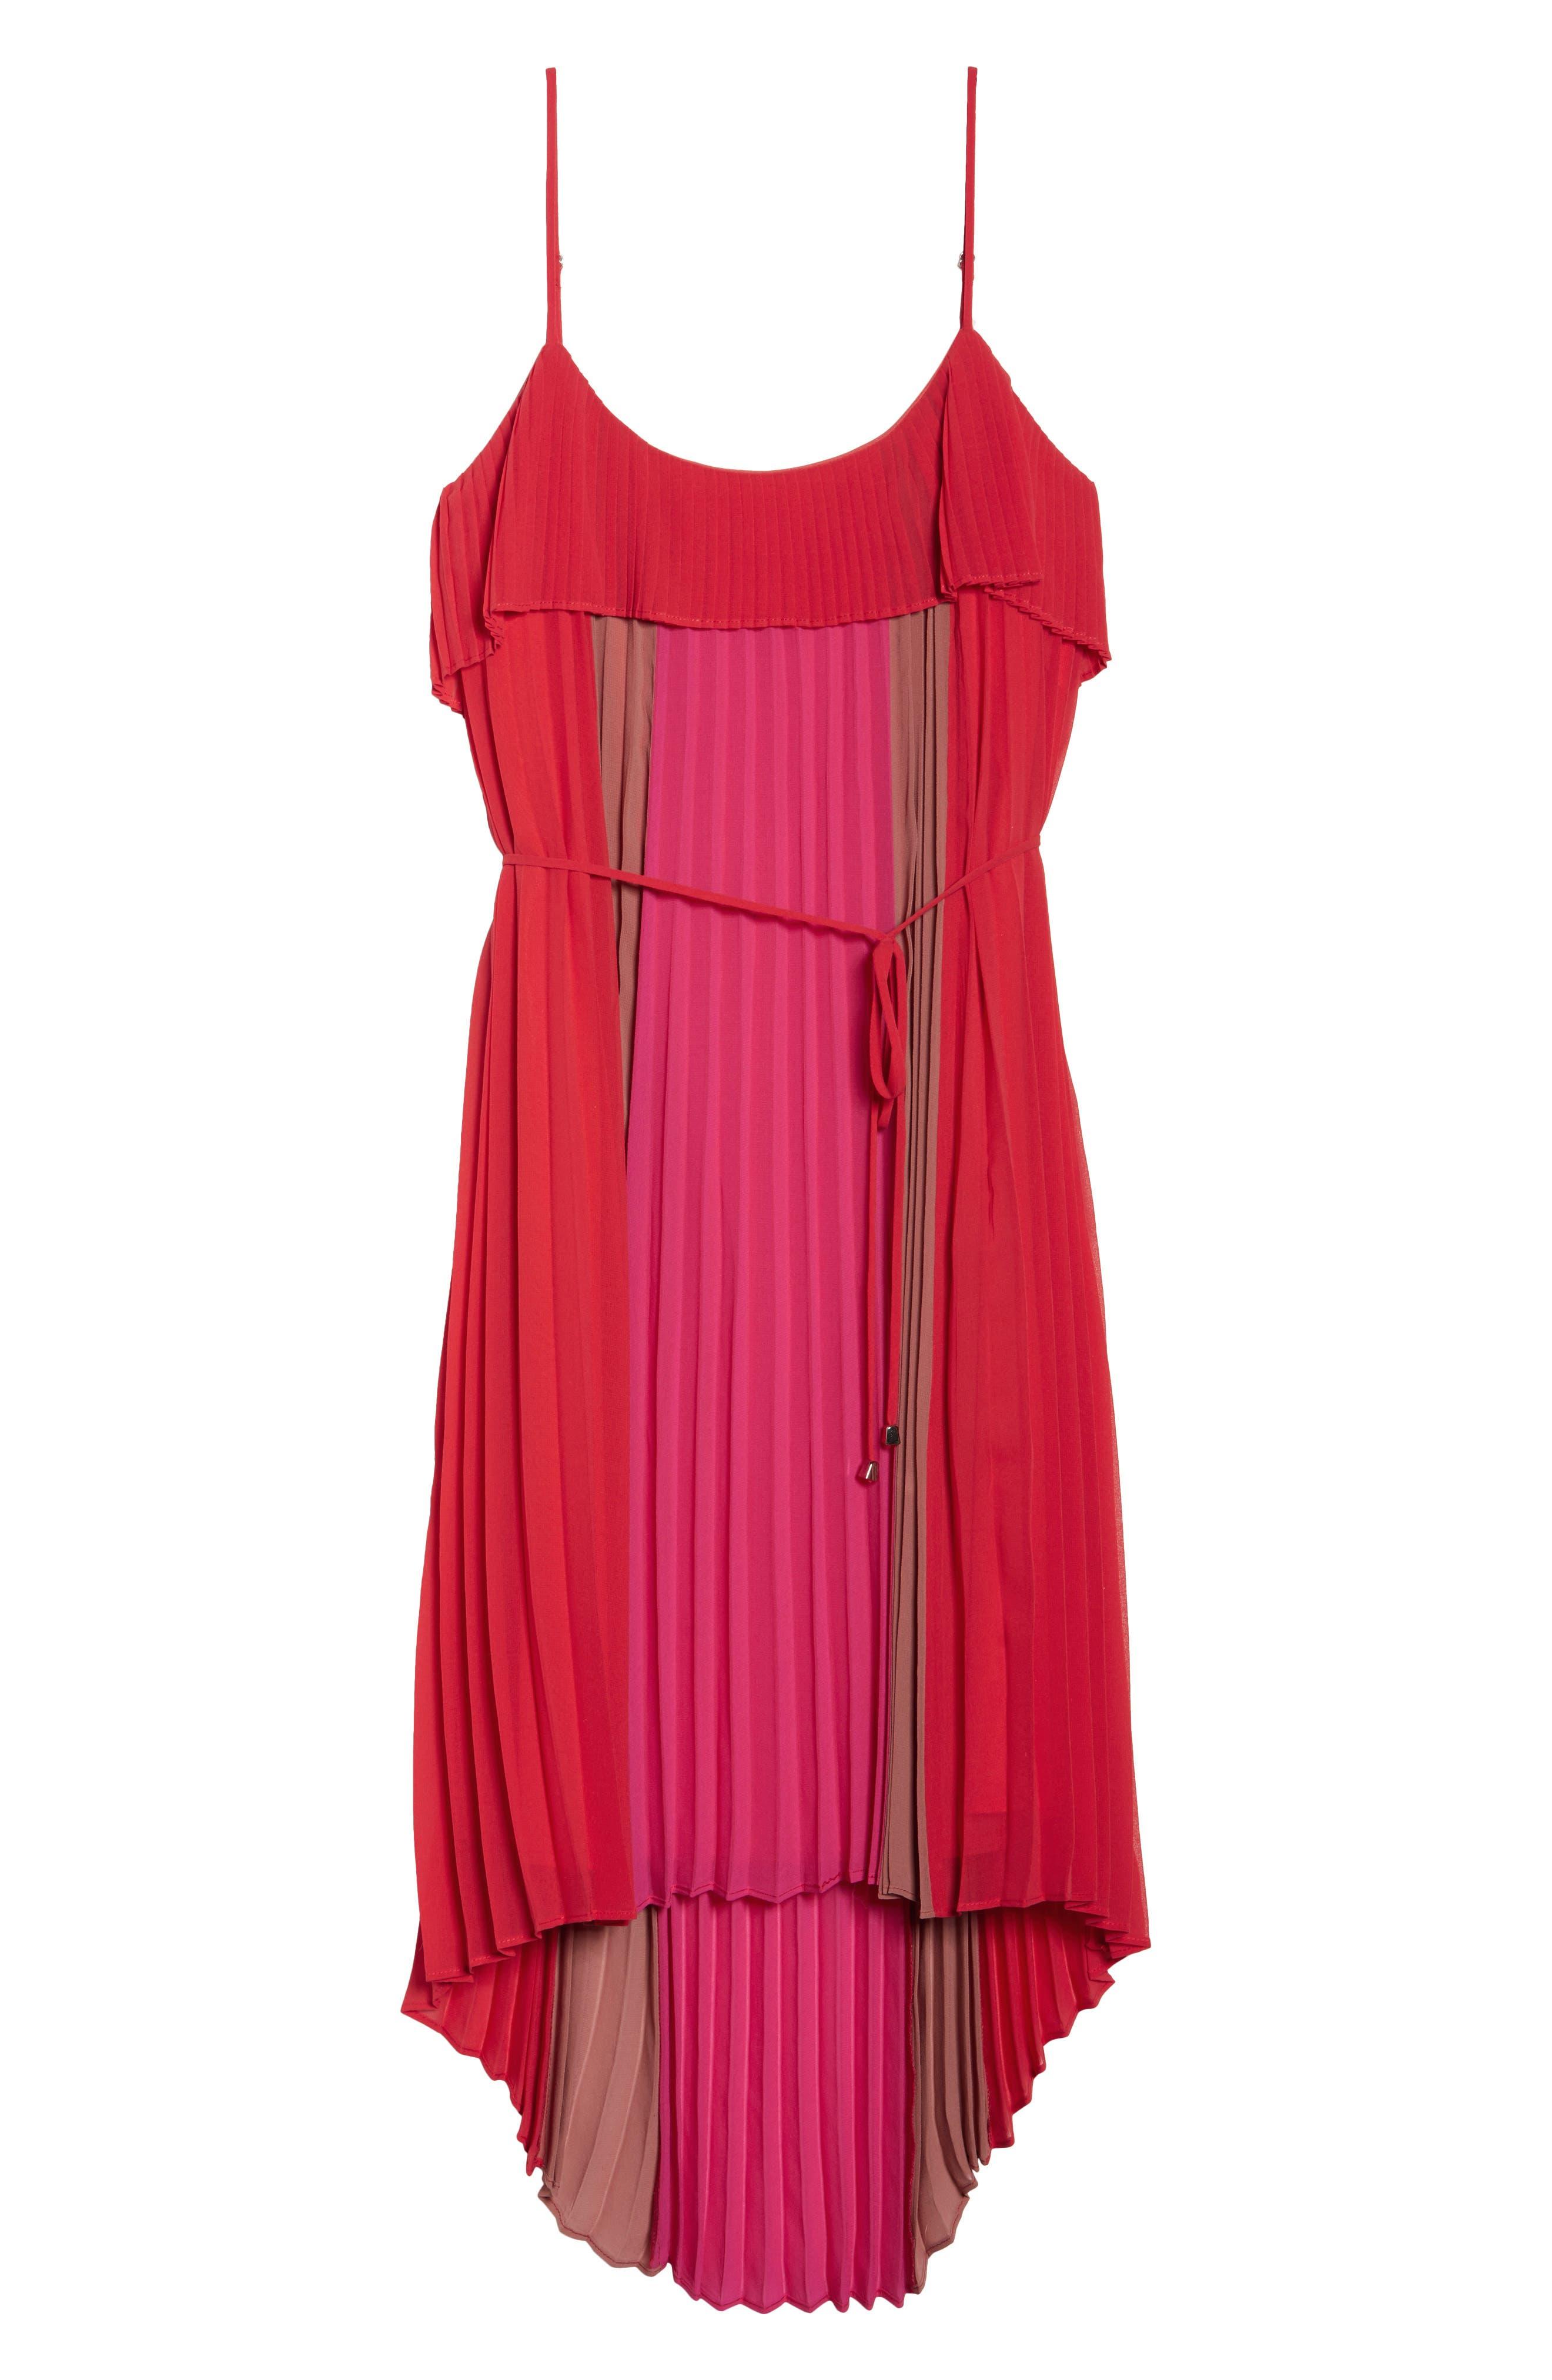 Pepper Pleated Dress,                             Alternate thumbnail 6, color,                             Red Multi